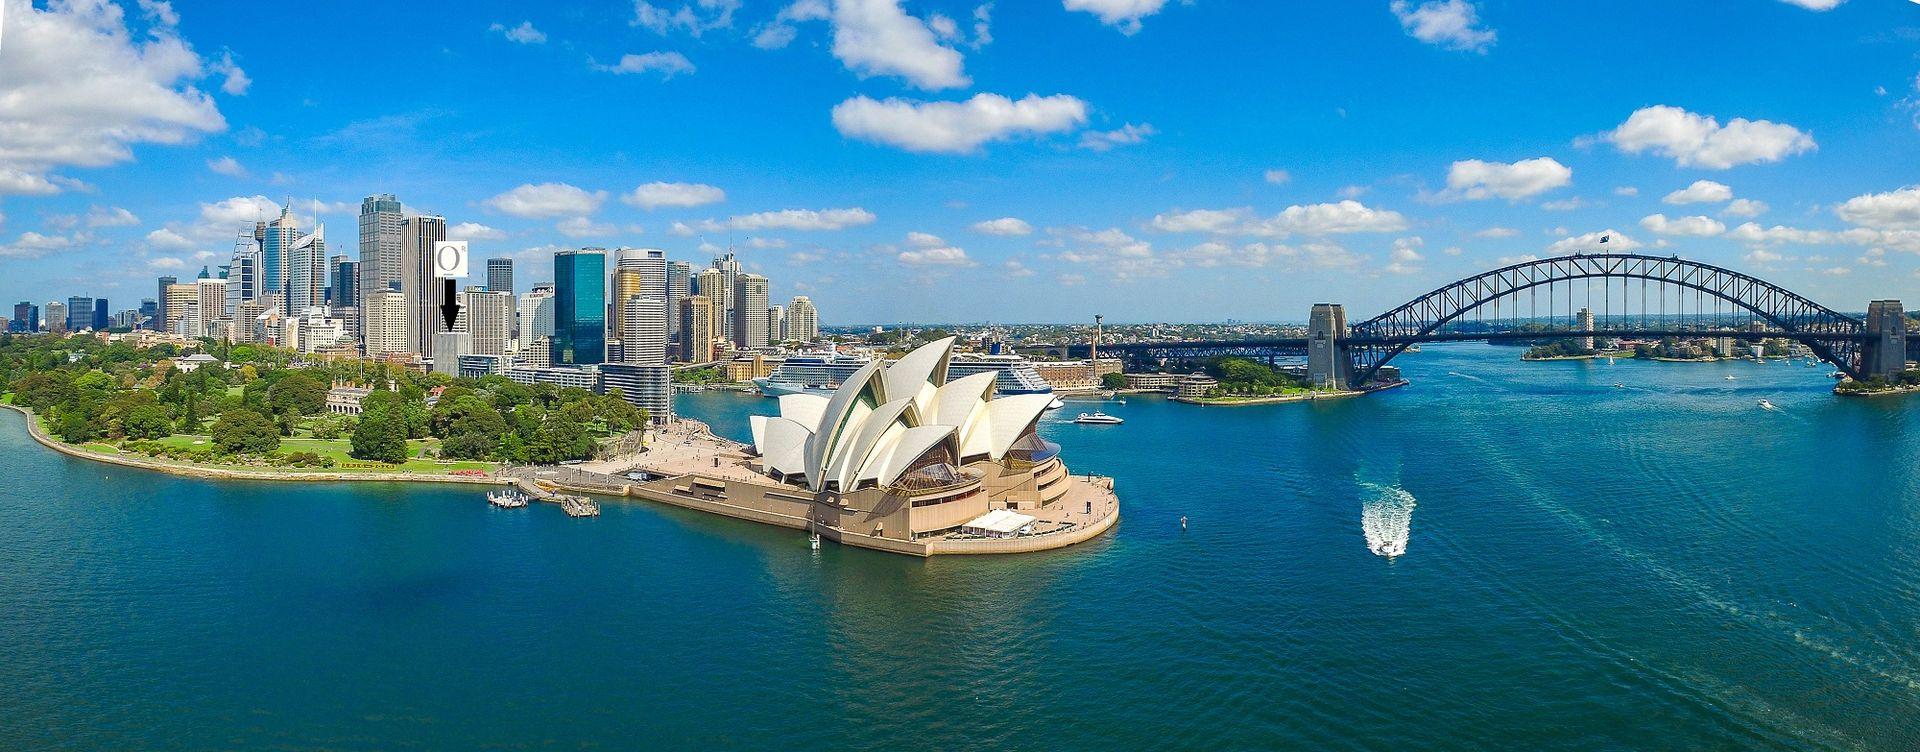 604/71-79 Macquarie St, Sydney NSW 2000, Image 0